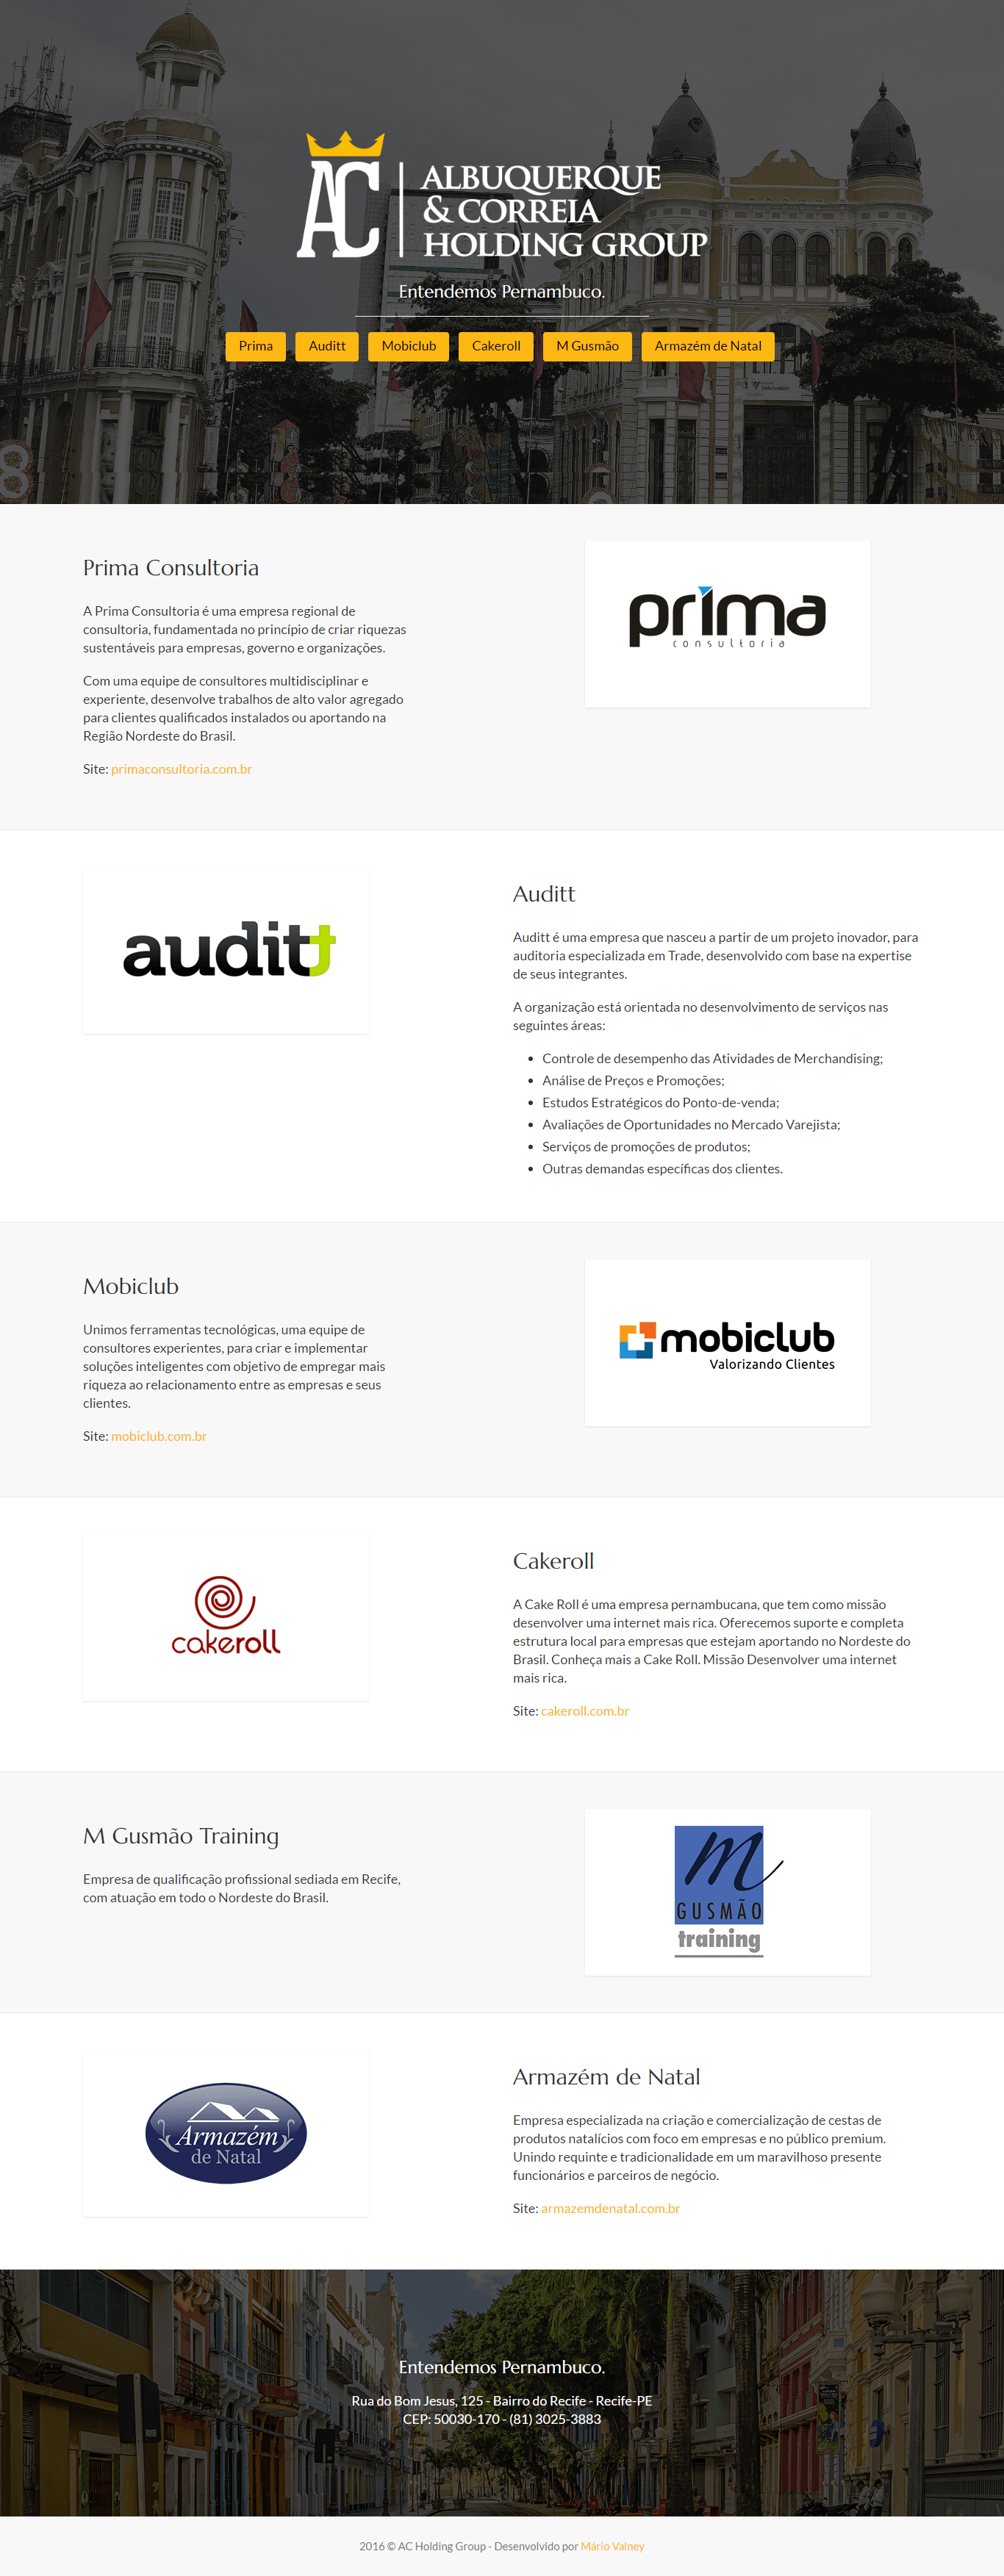 achg-desktop